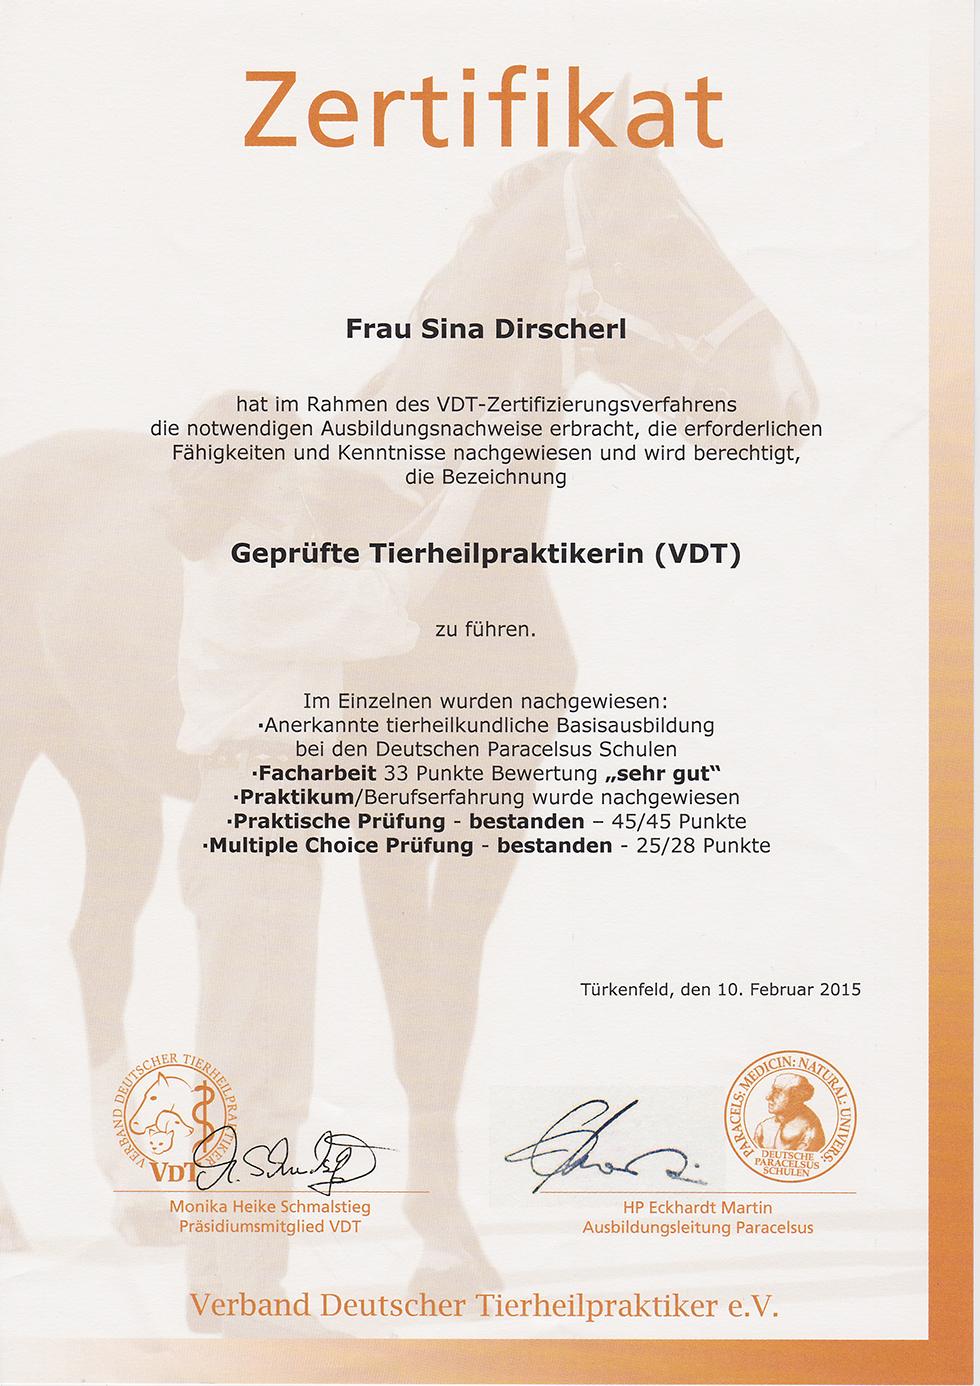 Zertifikat - Geprüfte Tierheilpraktikerin